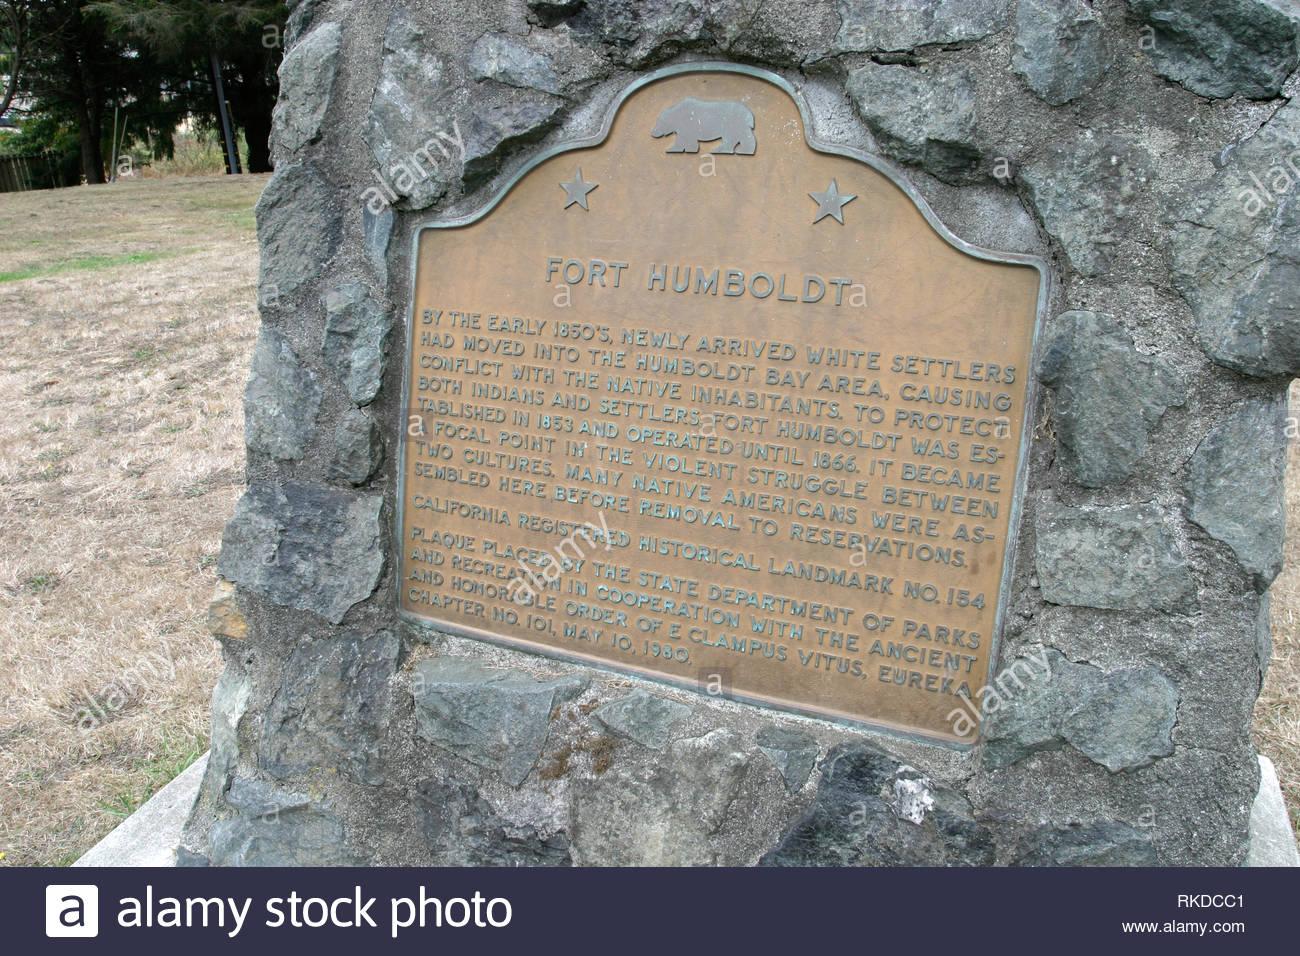 Fort Humboldt State Historic Site Eureka California Usa